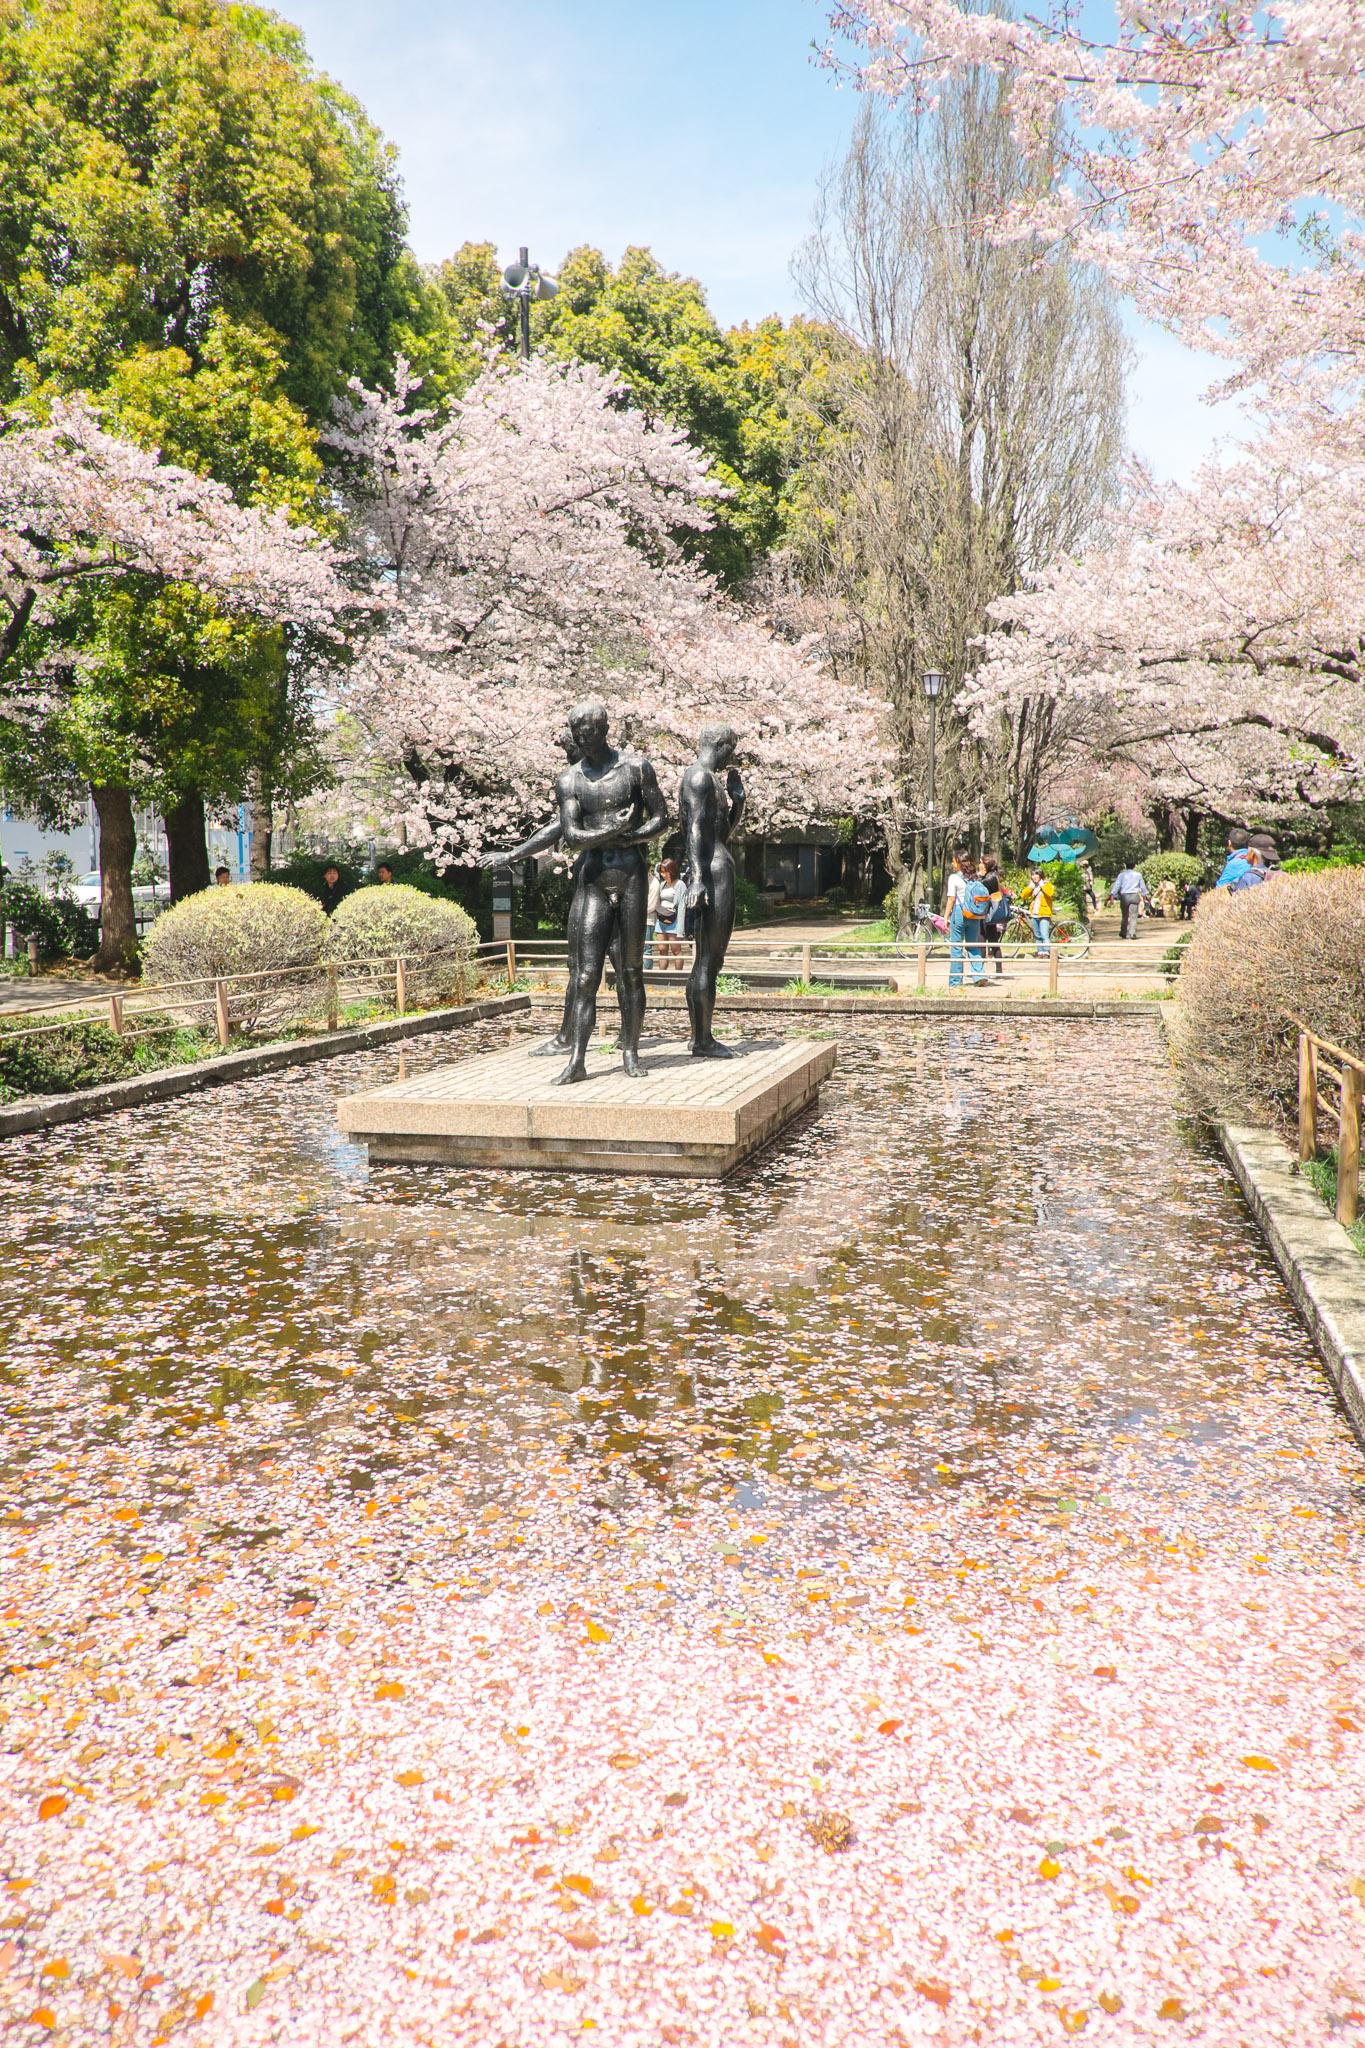 japan-tokyo-cherry-blossom-2.jpg